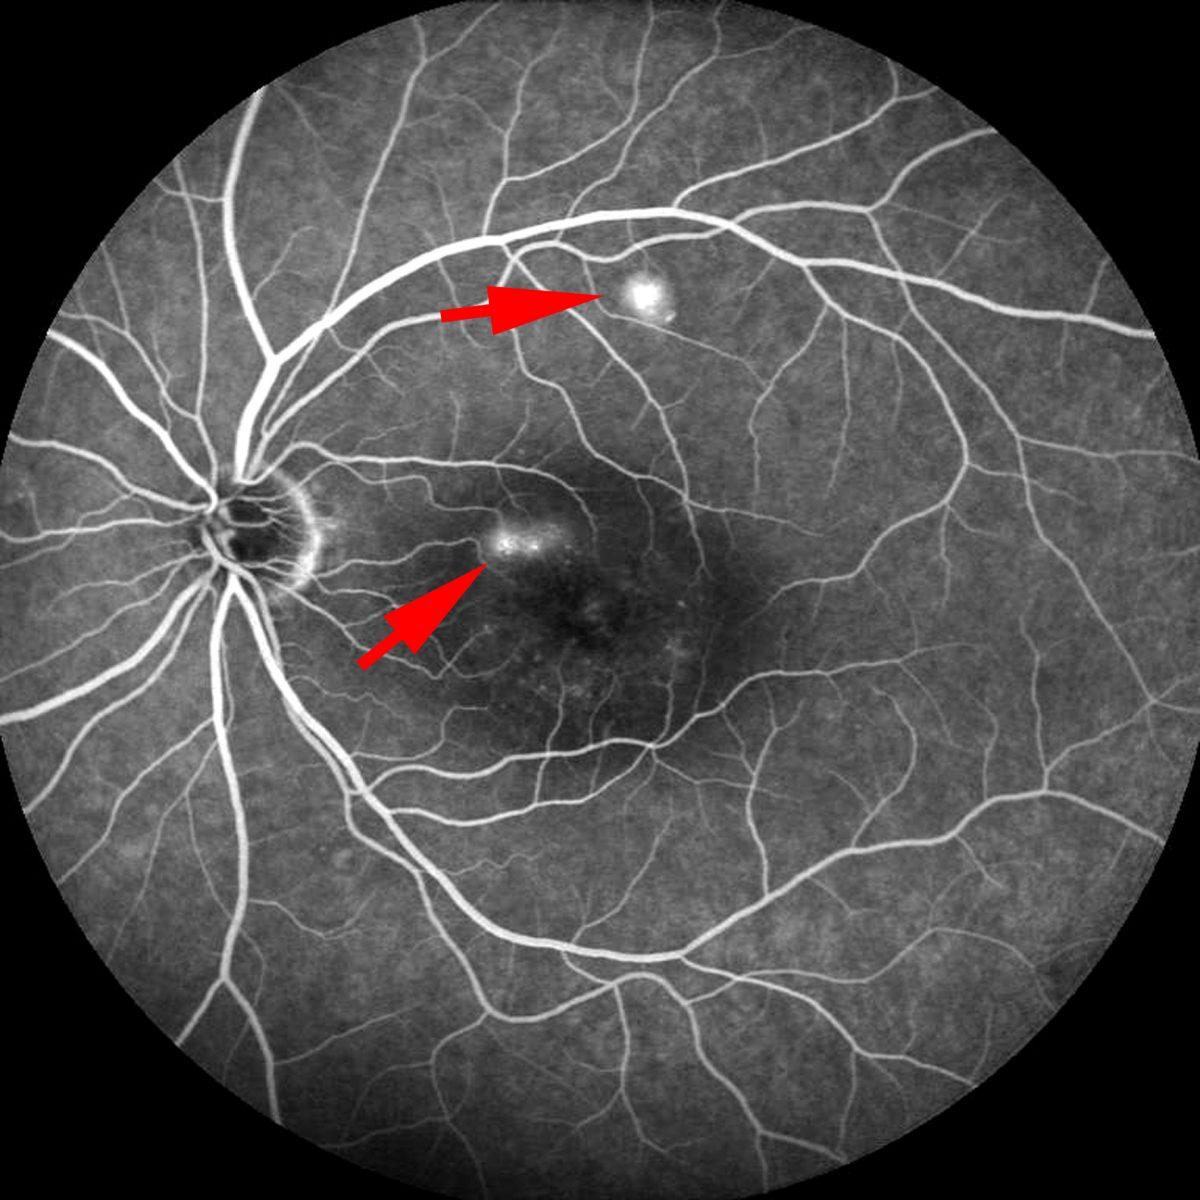 retinop_sierosa-_centrale-1200x1200.jpg